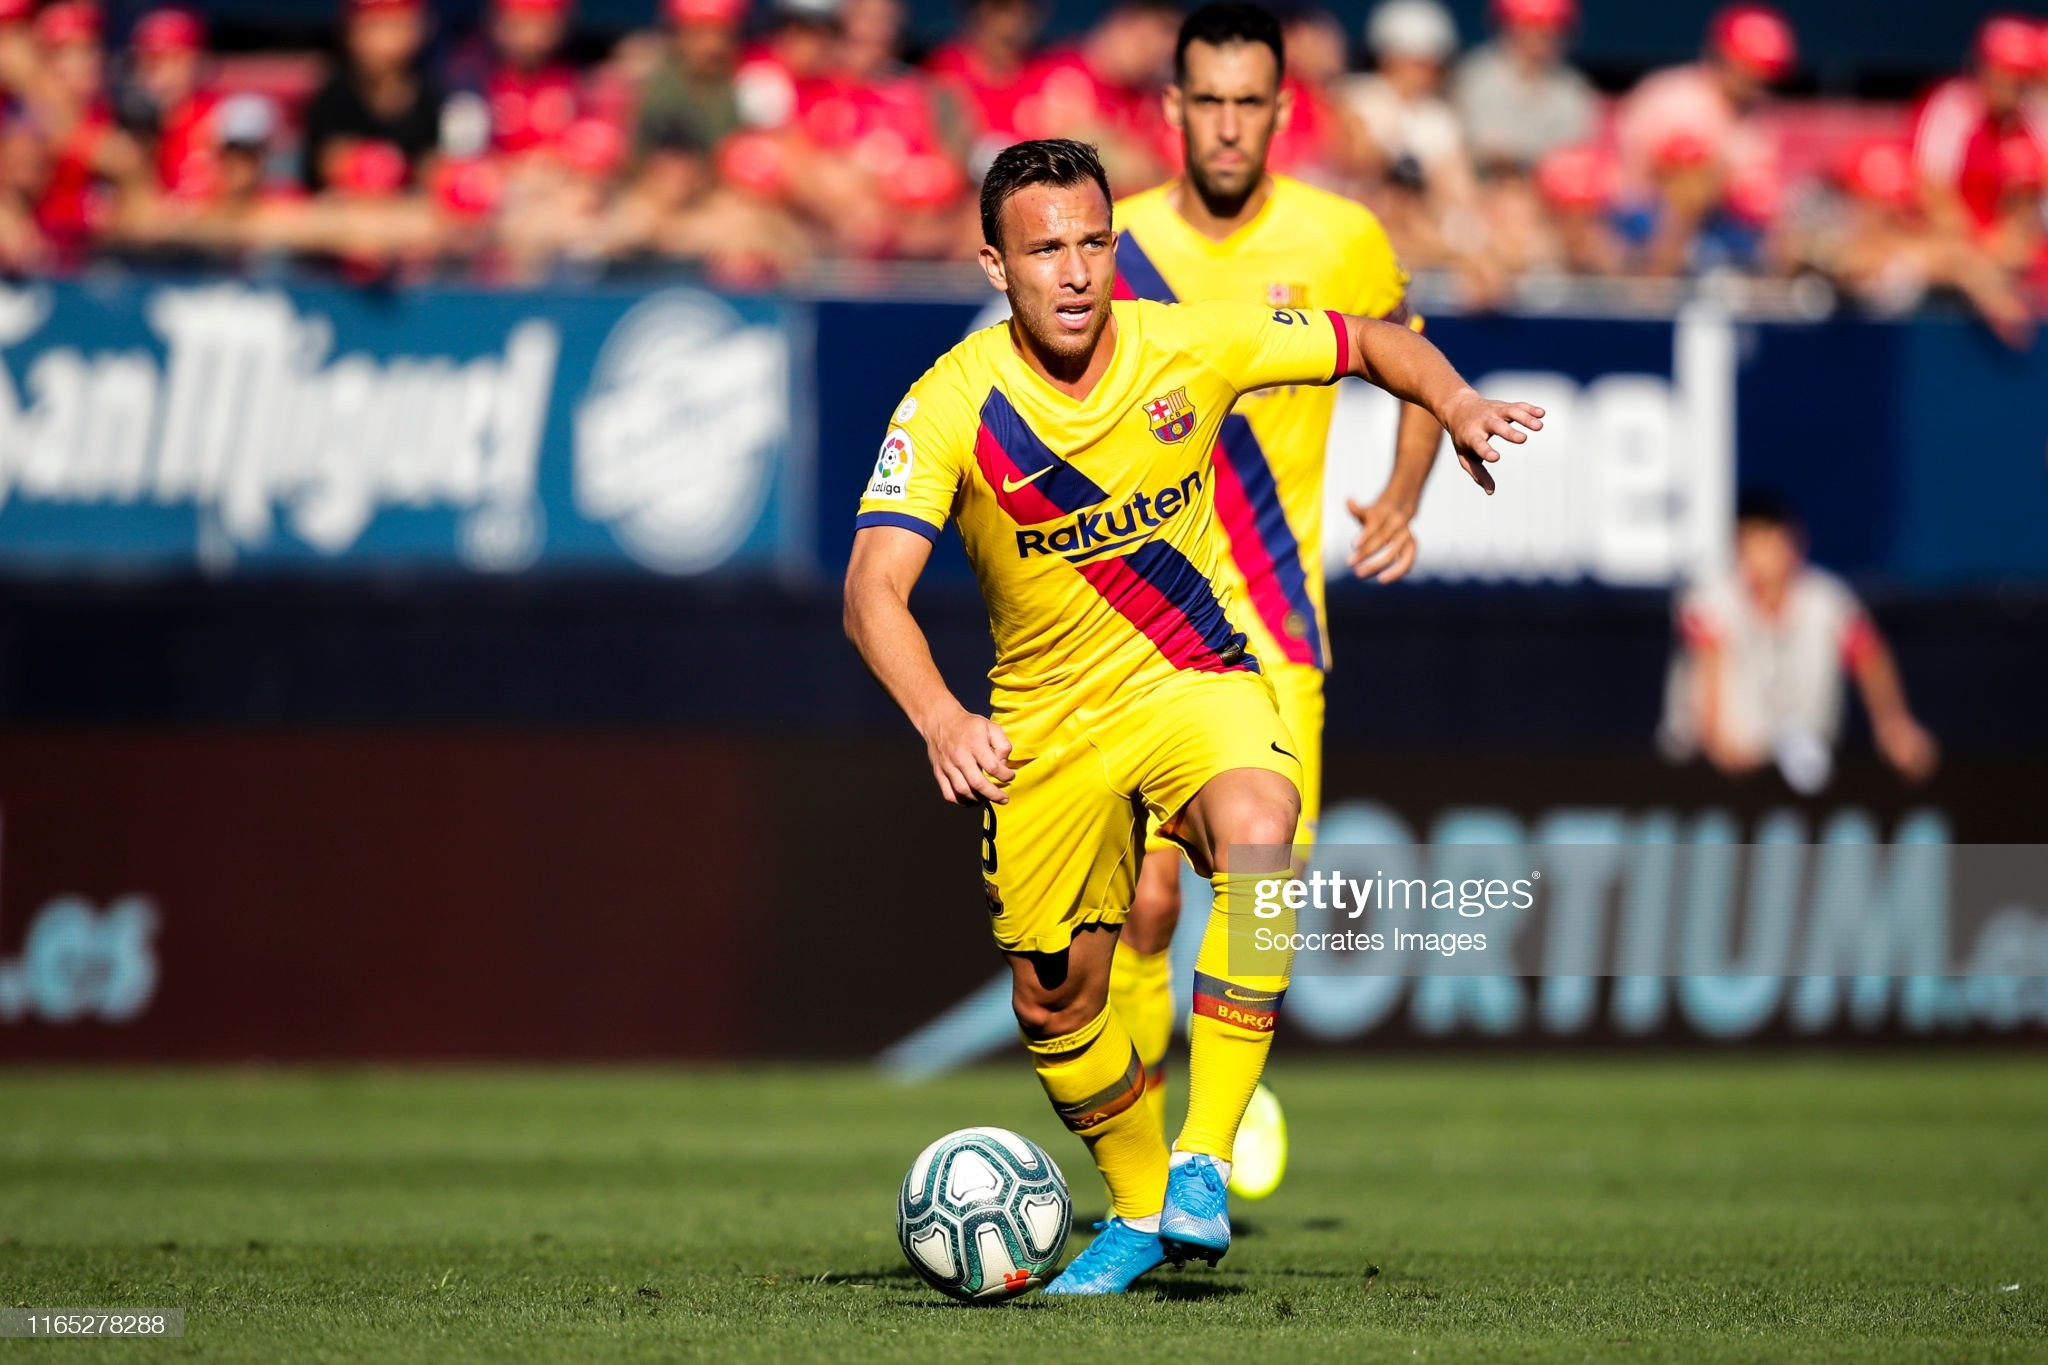 صور مباراة : أوساسونا - برشلونة 2-2 ( 31-08-2019 )  Arthur-of-fc-barcelona-during-the-la-liga-santander-match-between-v-picture-id1165278288?s=2048x2048